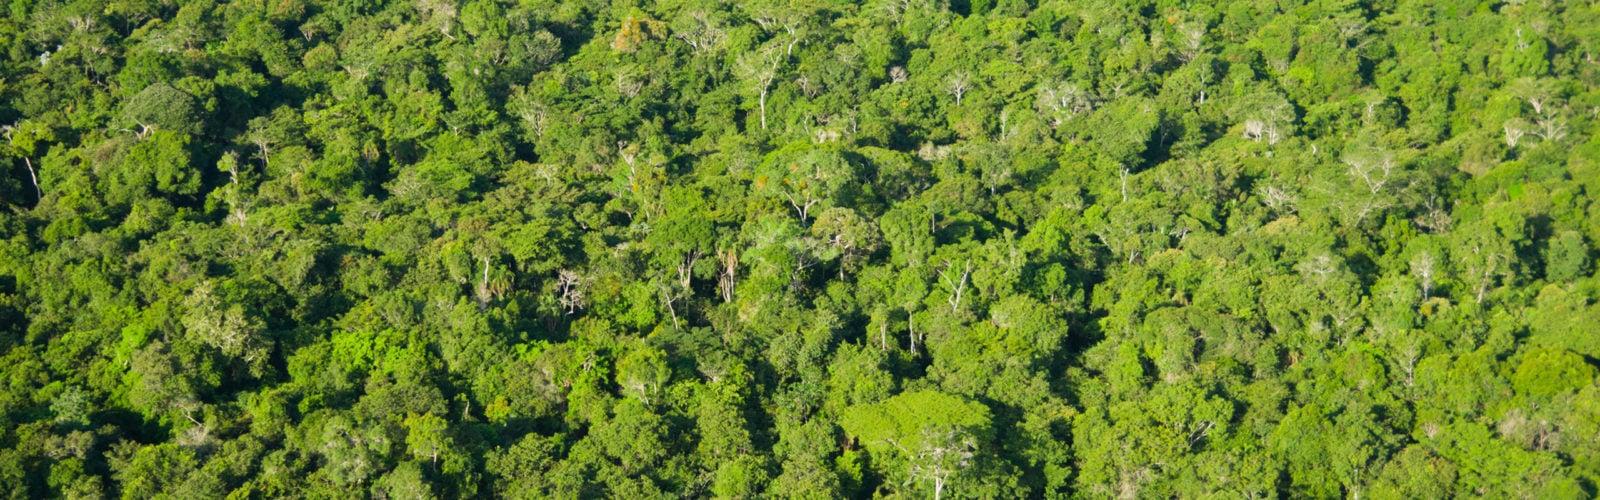 brazil-amazon-canopy